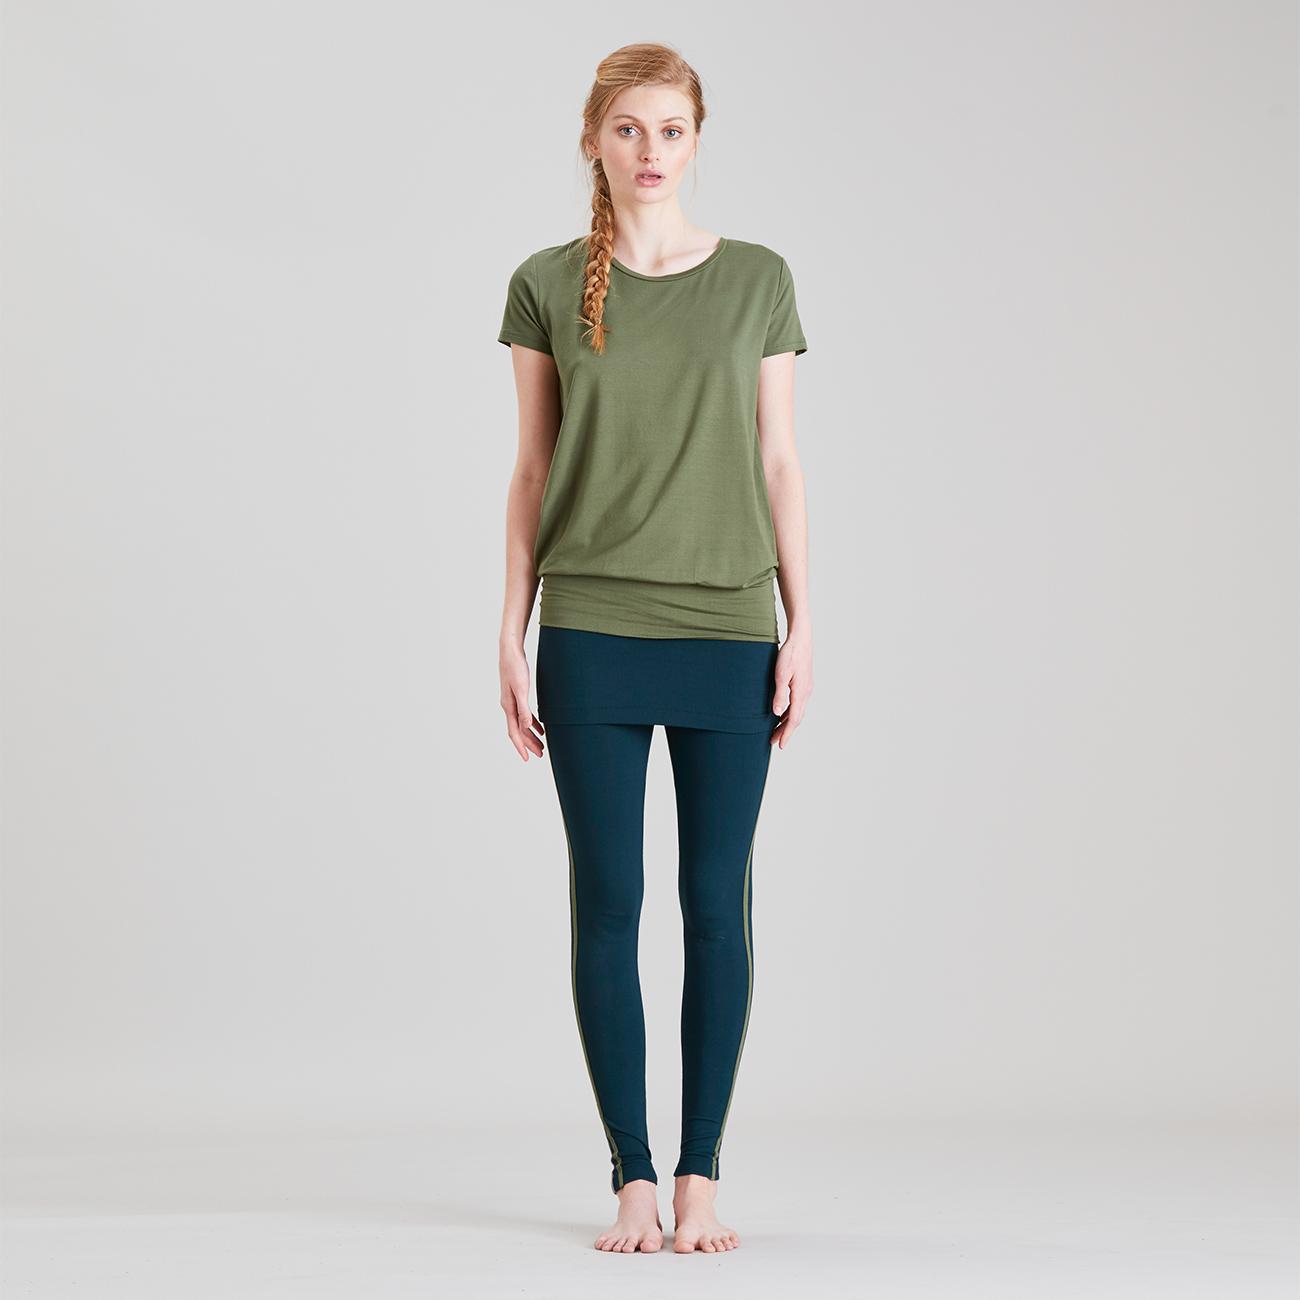 Smooth You Leggings - Forest | Yoga Leggings | Damen ...